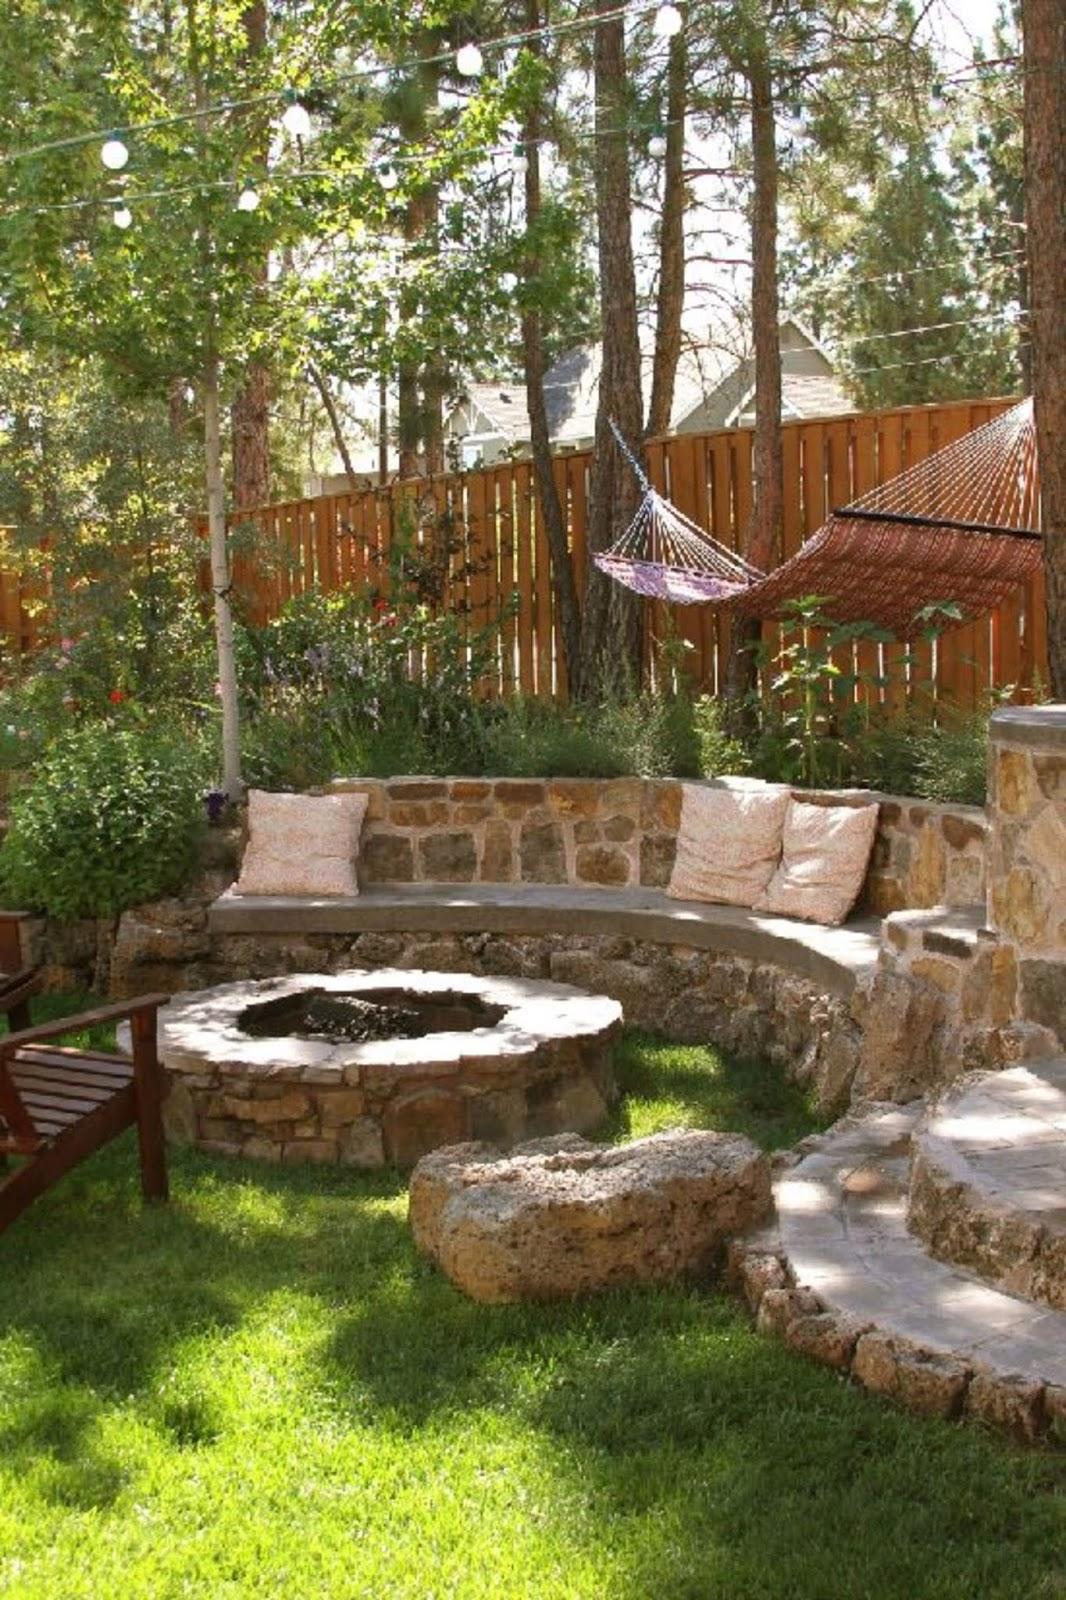 Cozy Sunken Sitting Areas For a Mesmerizing Backyard Landscape